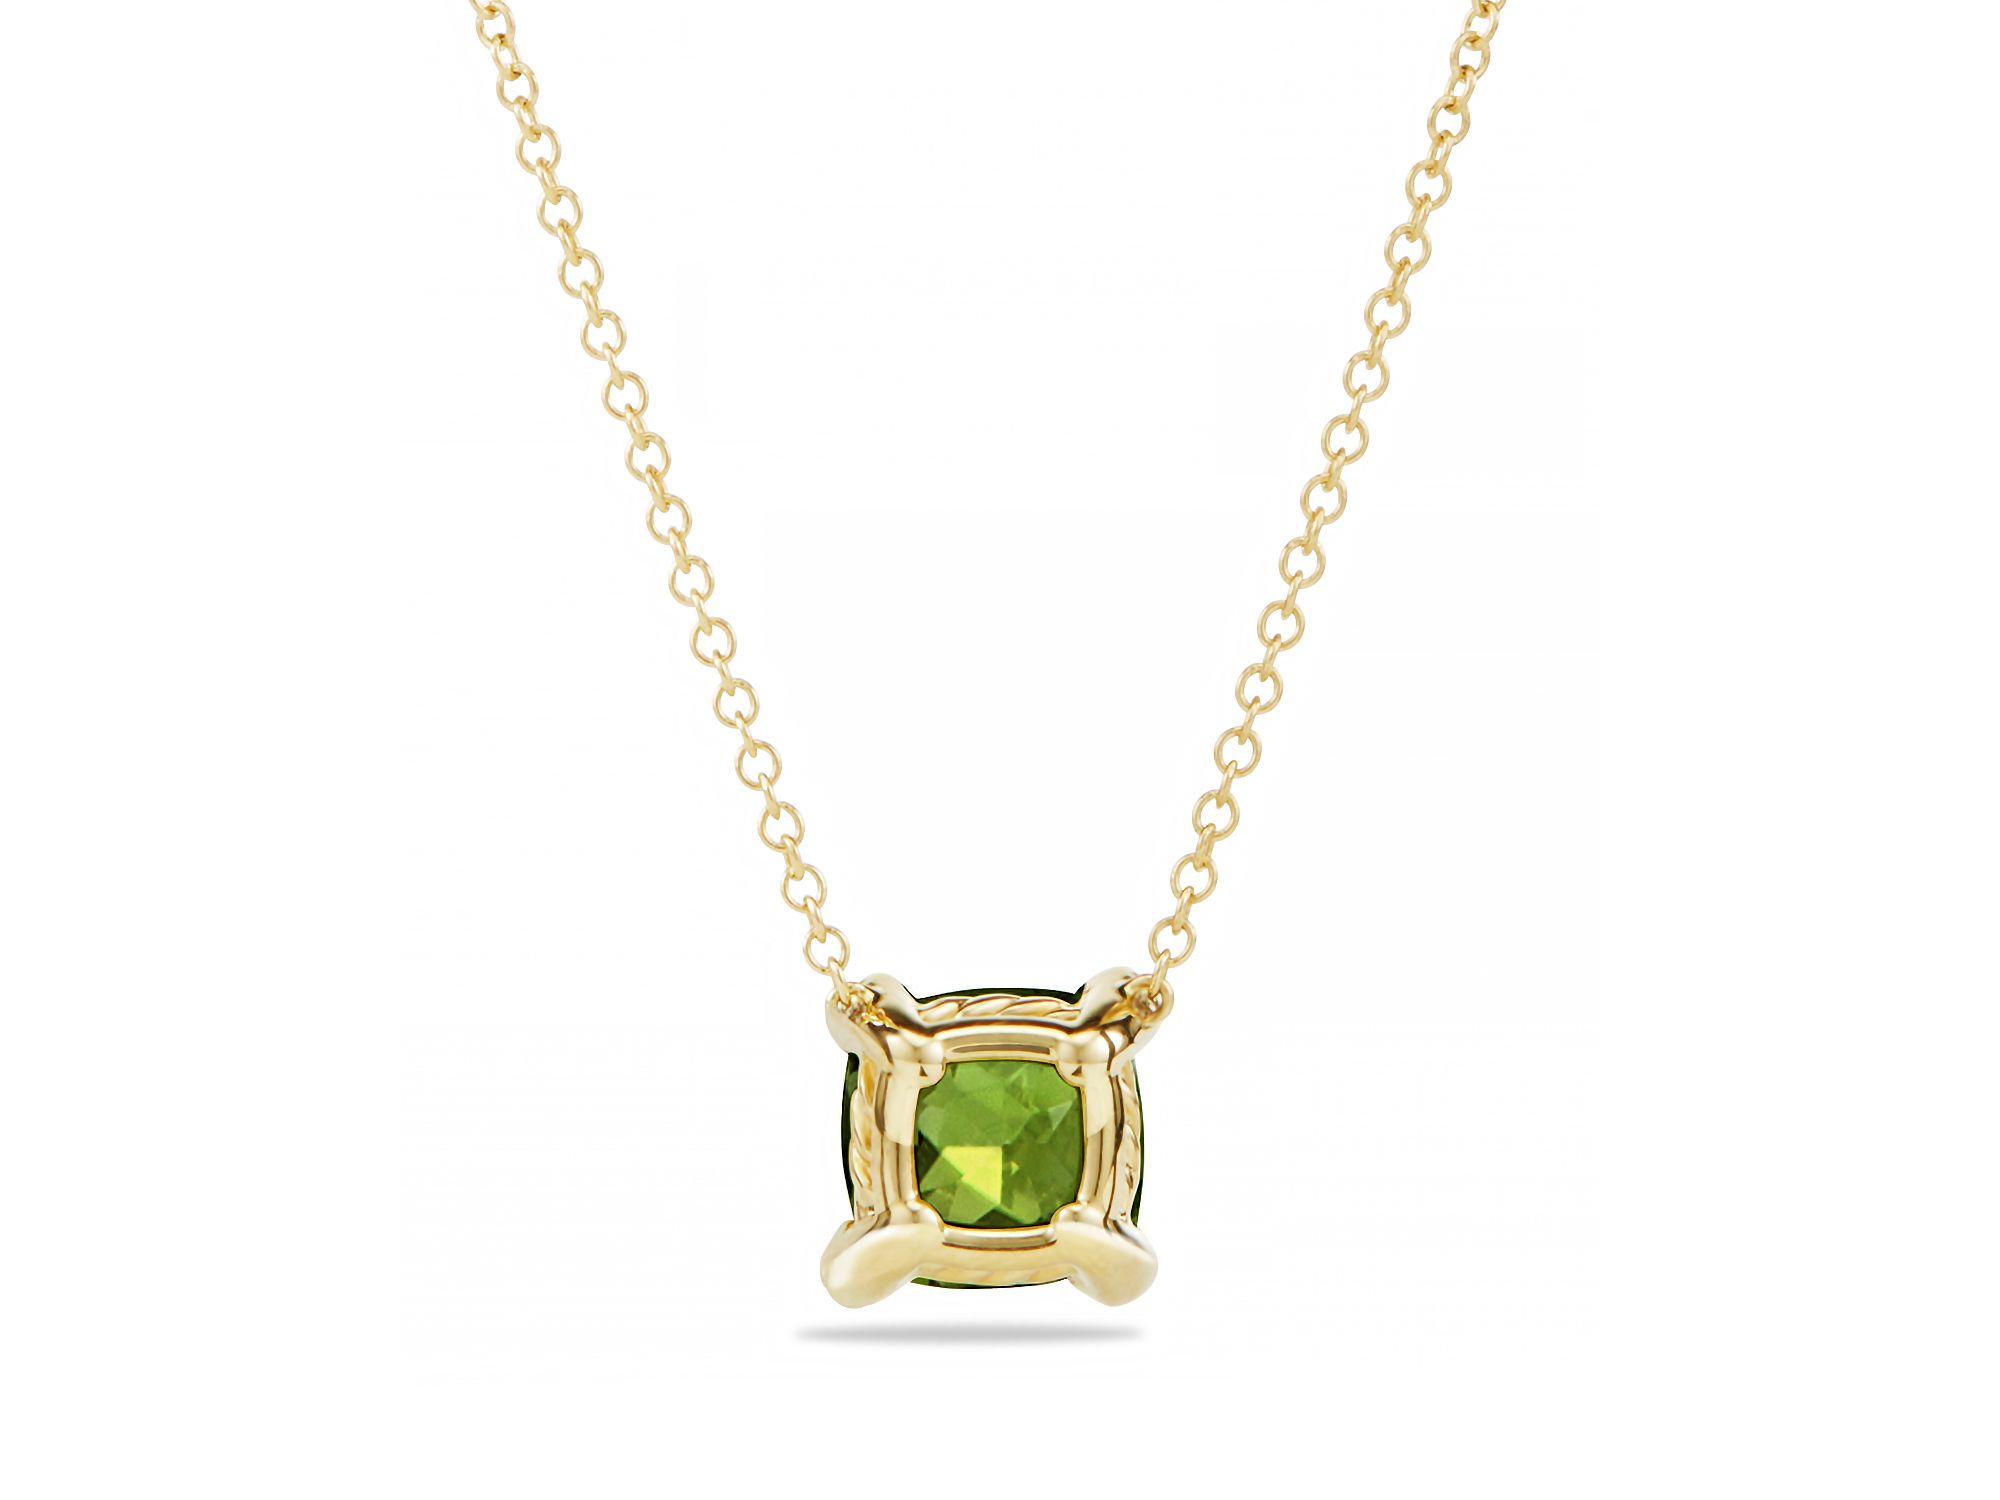 David Yurman Ch 226 Telaine Pendant Necklace With Peridot And